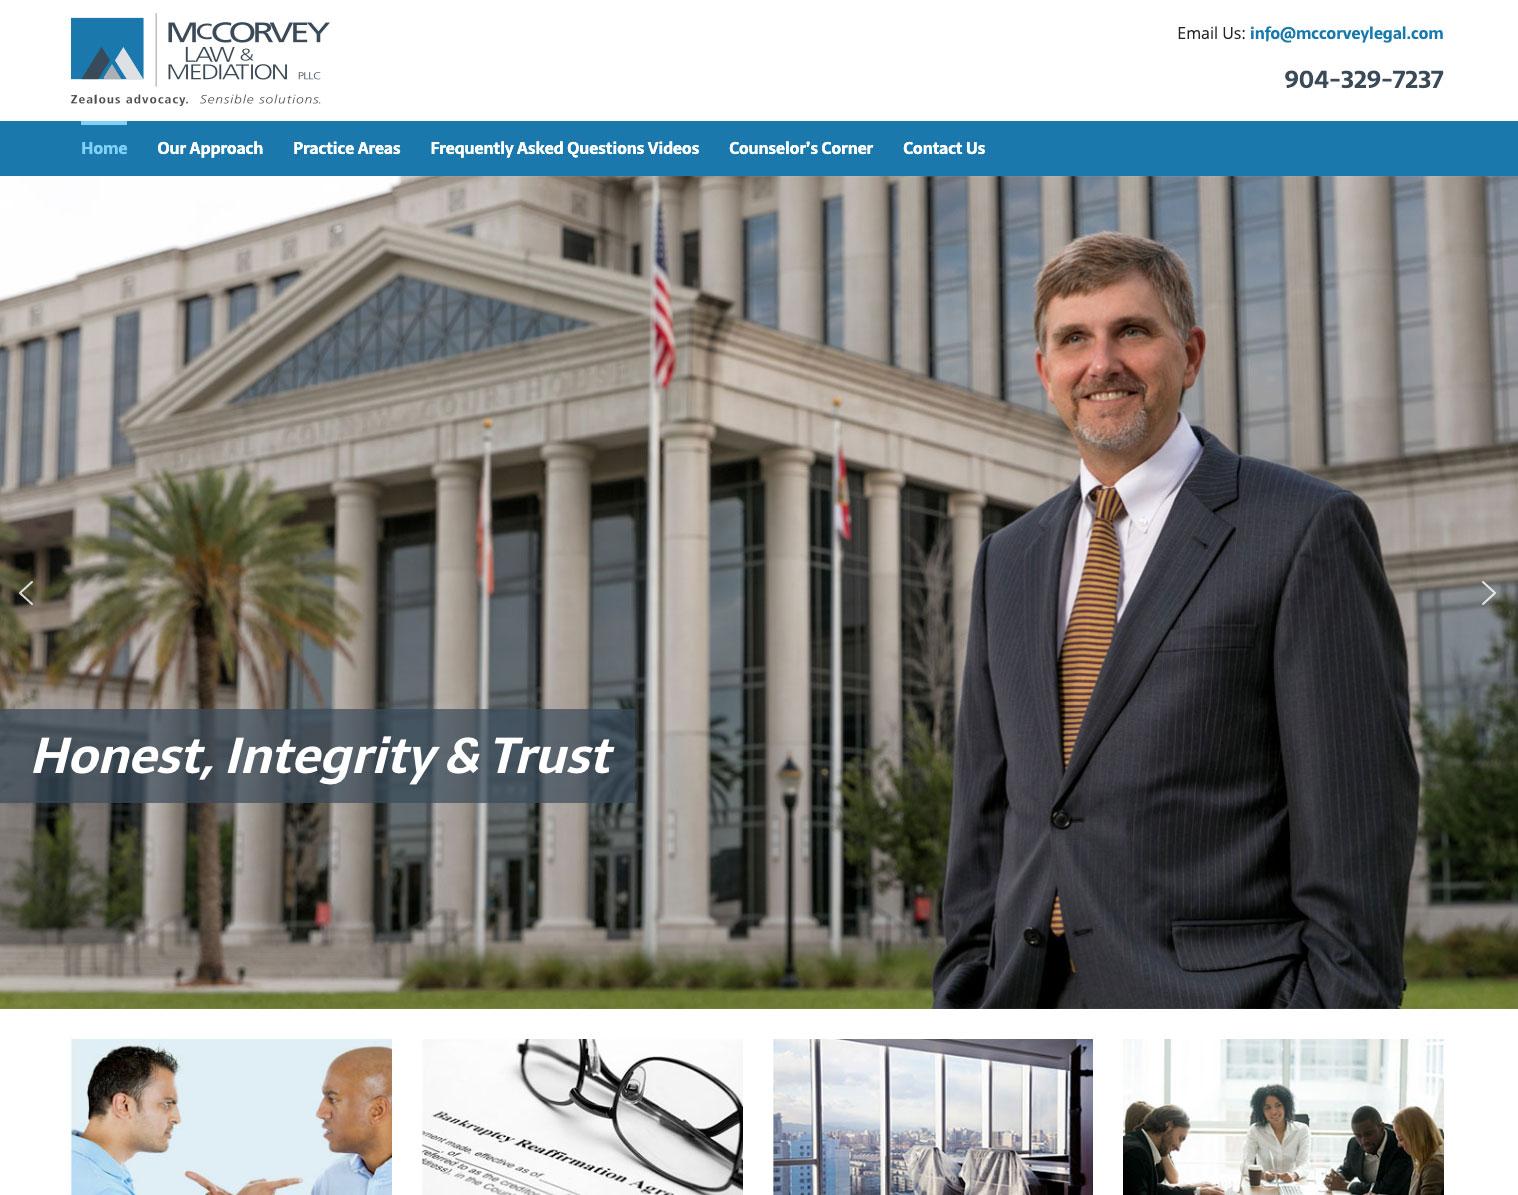 McCorvey Law & Mediation